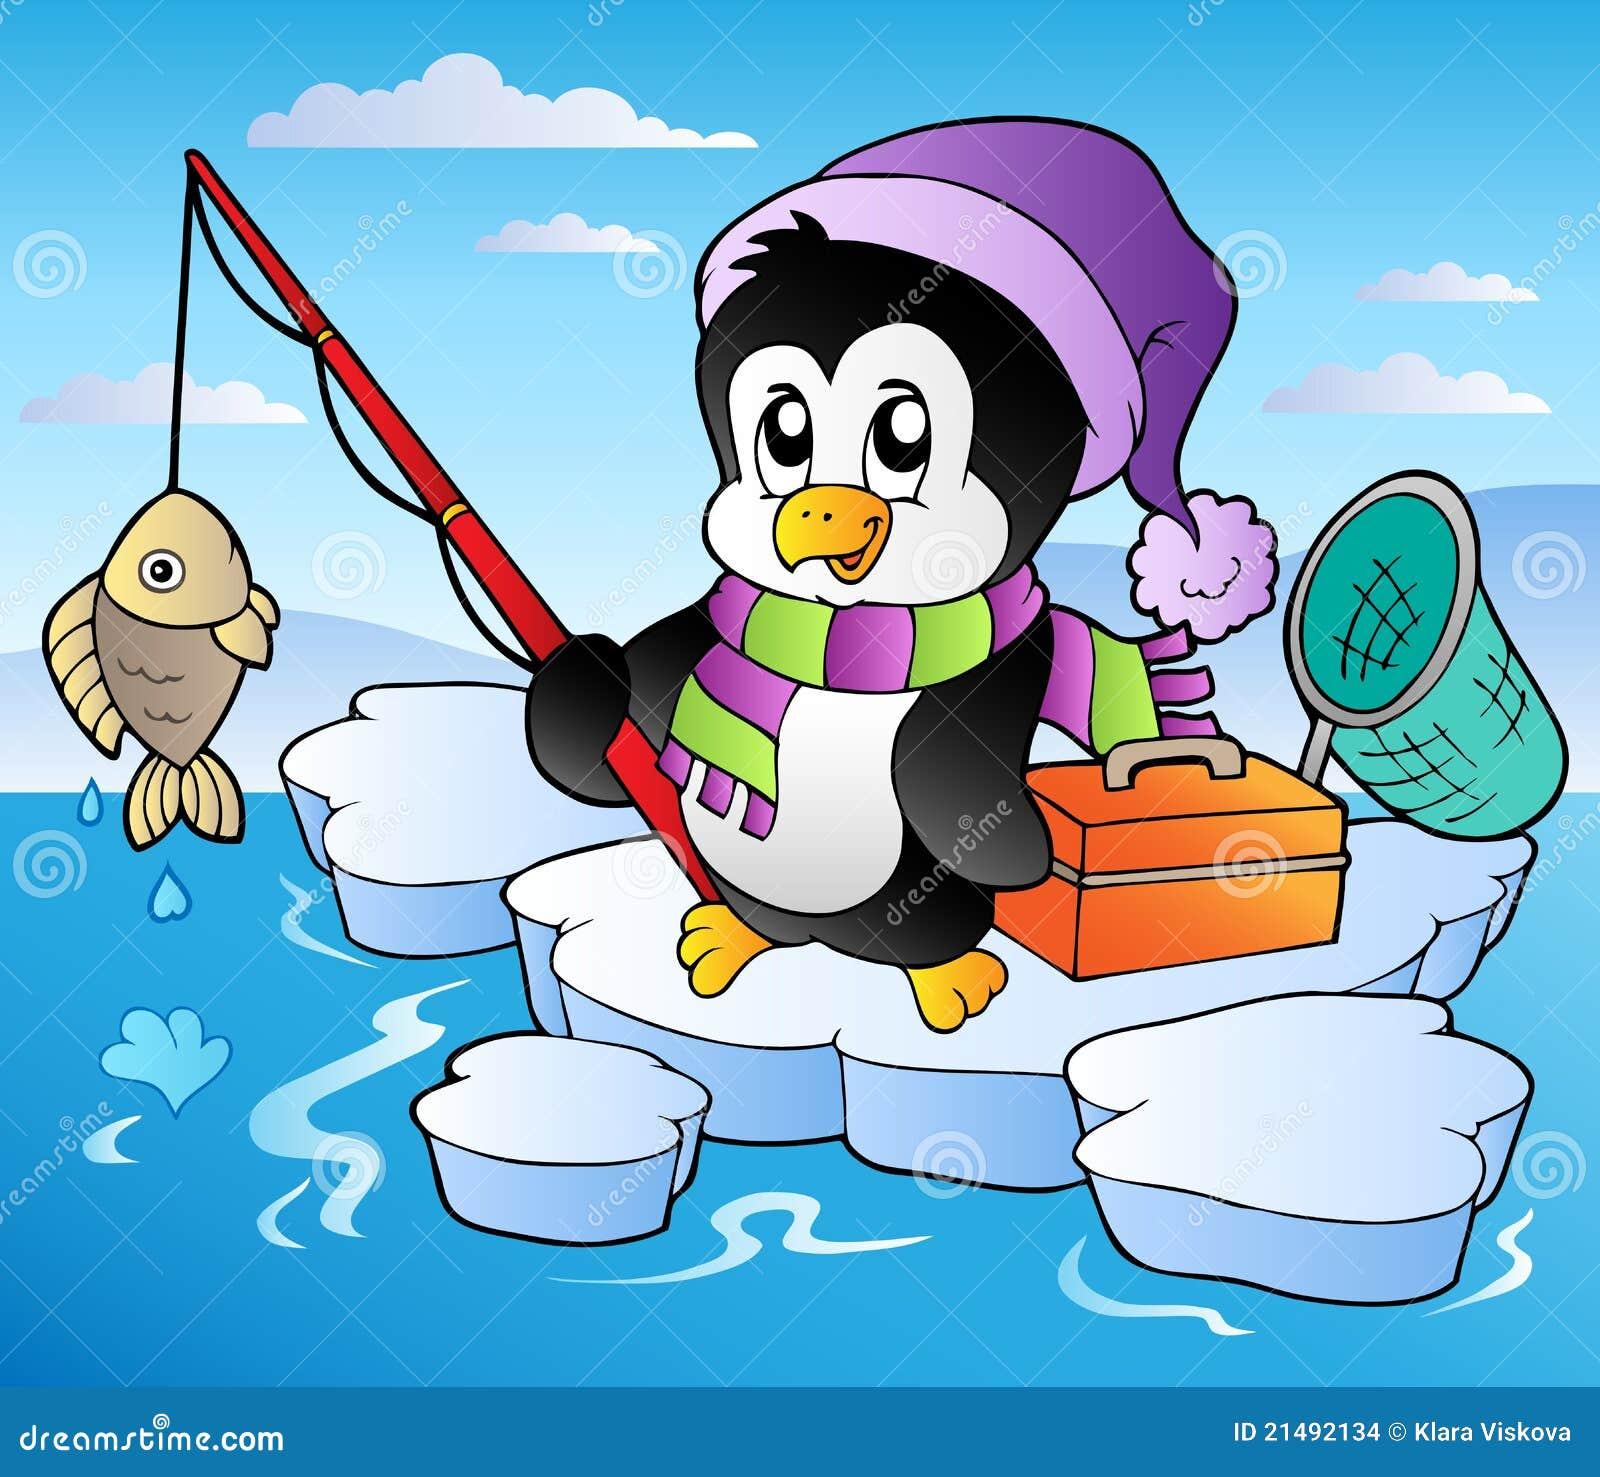 Cartoon Fishing Penguin Stock Images - Image: 21492134